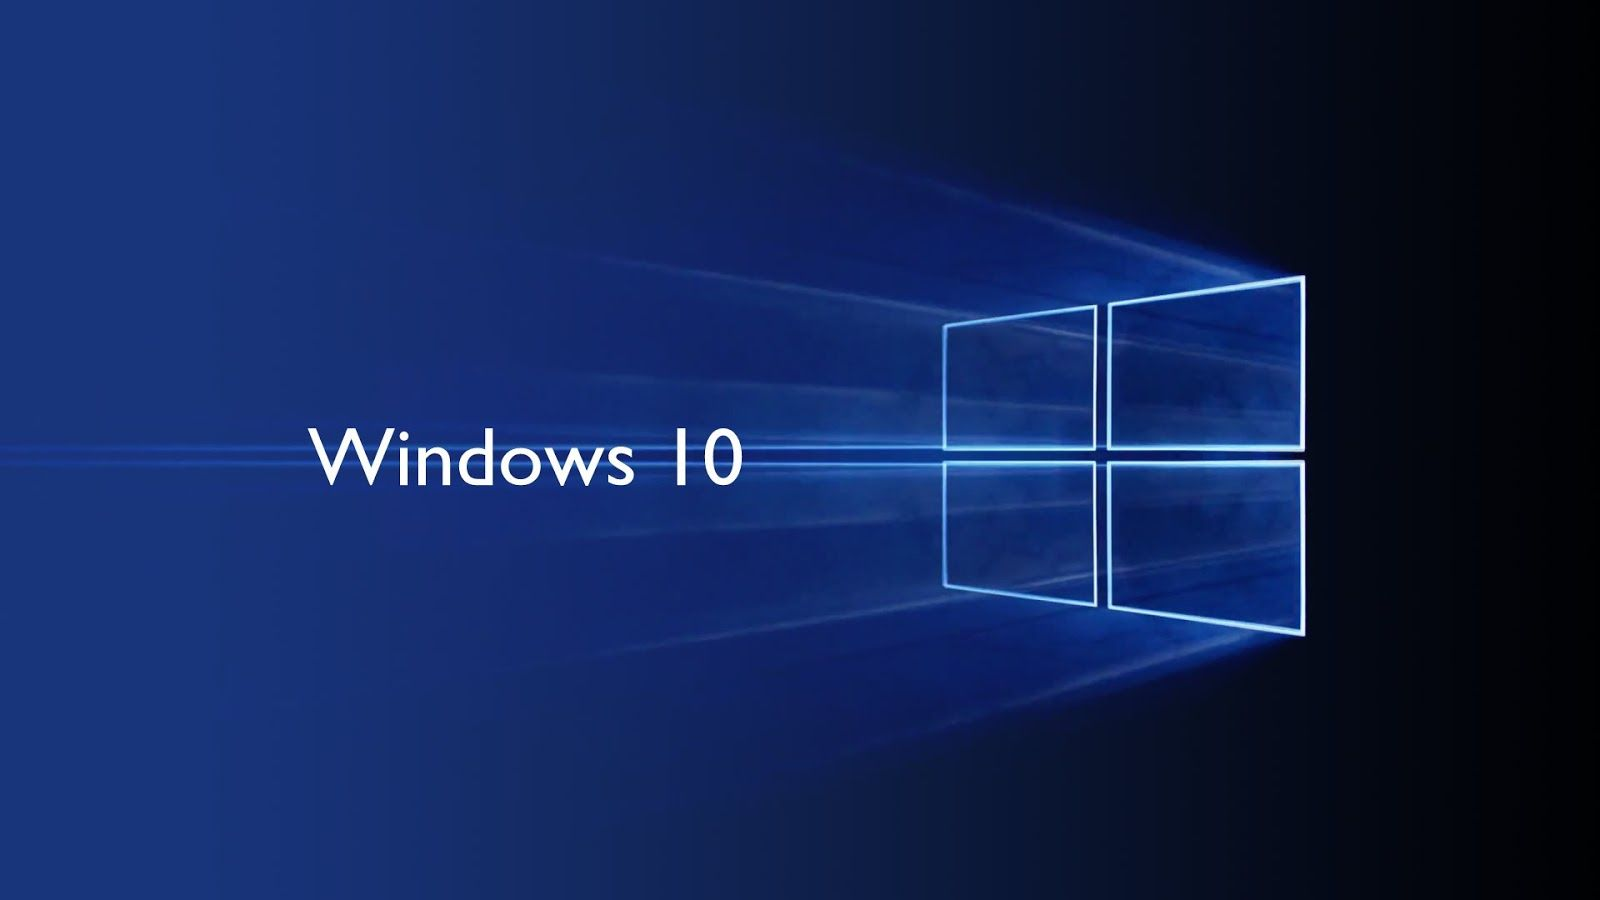 Windows 10 Wallpaper Jpg 1600 900 Microsoft Wallpaper Windows 10 Windows 10 Microsoft